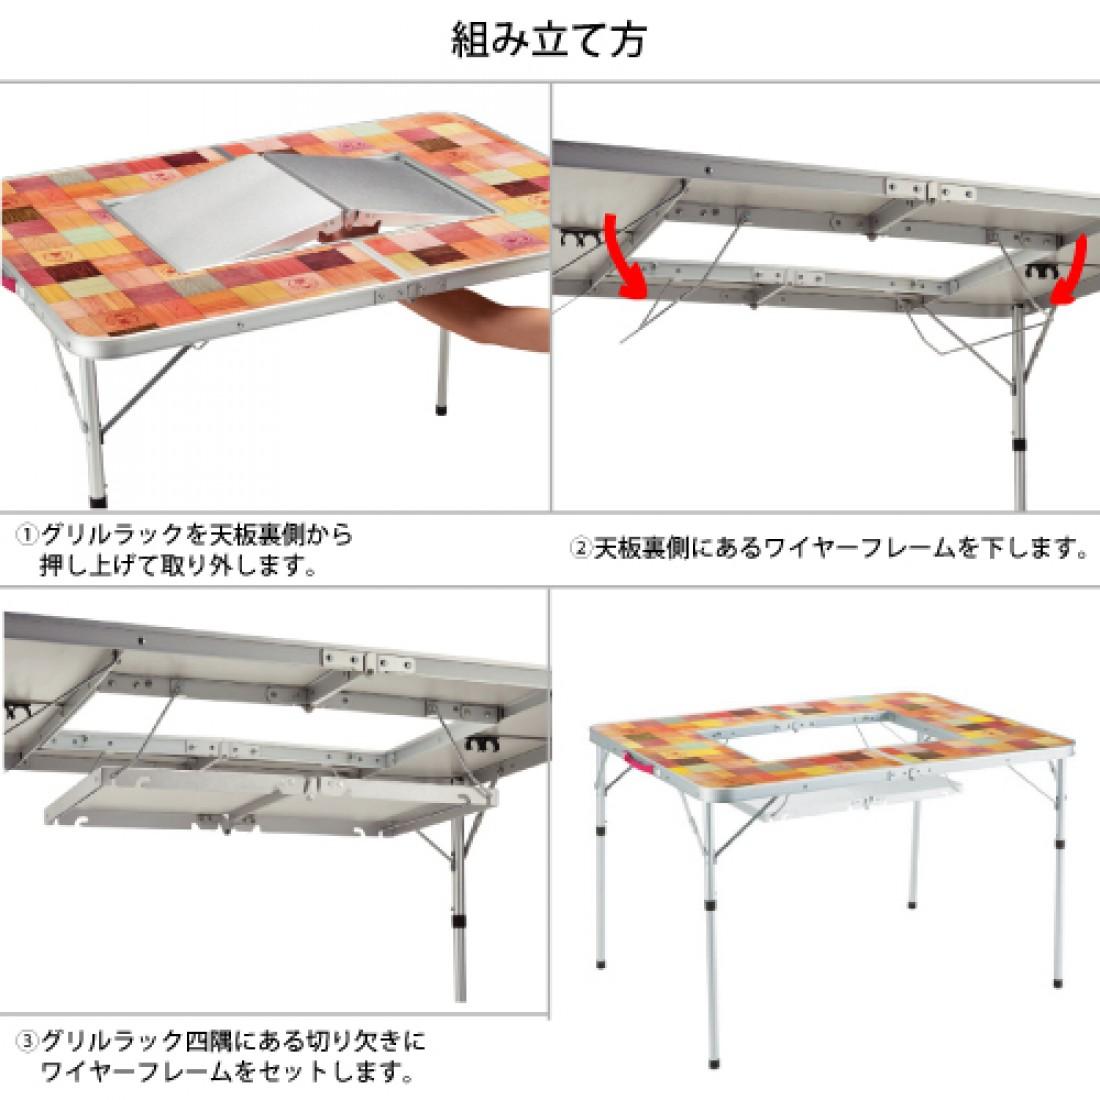 COLEMAN NATURAL MOSAIC BBQ TABLE/110 PLUS